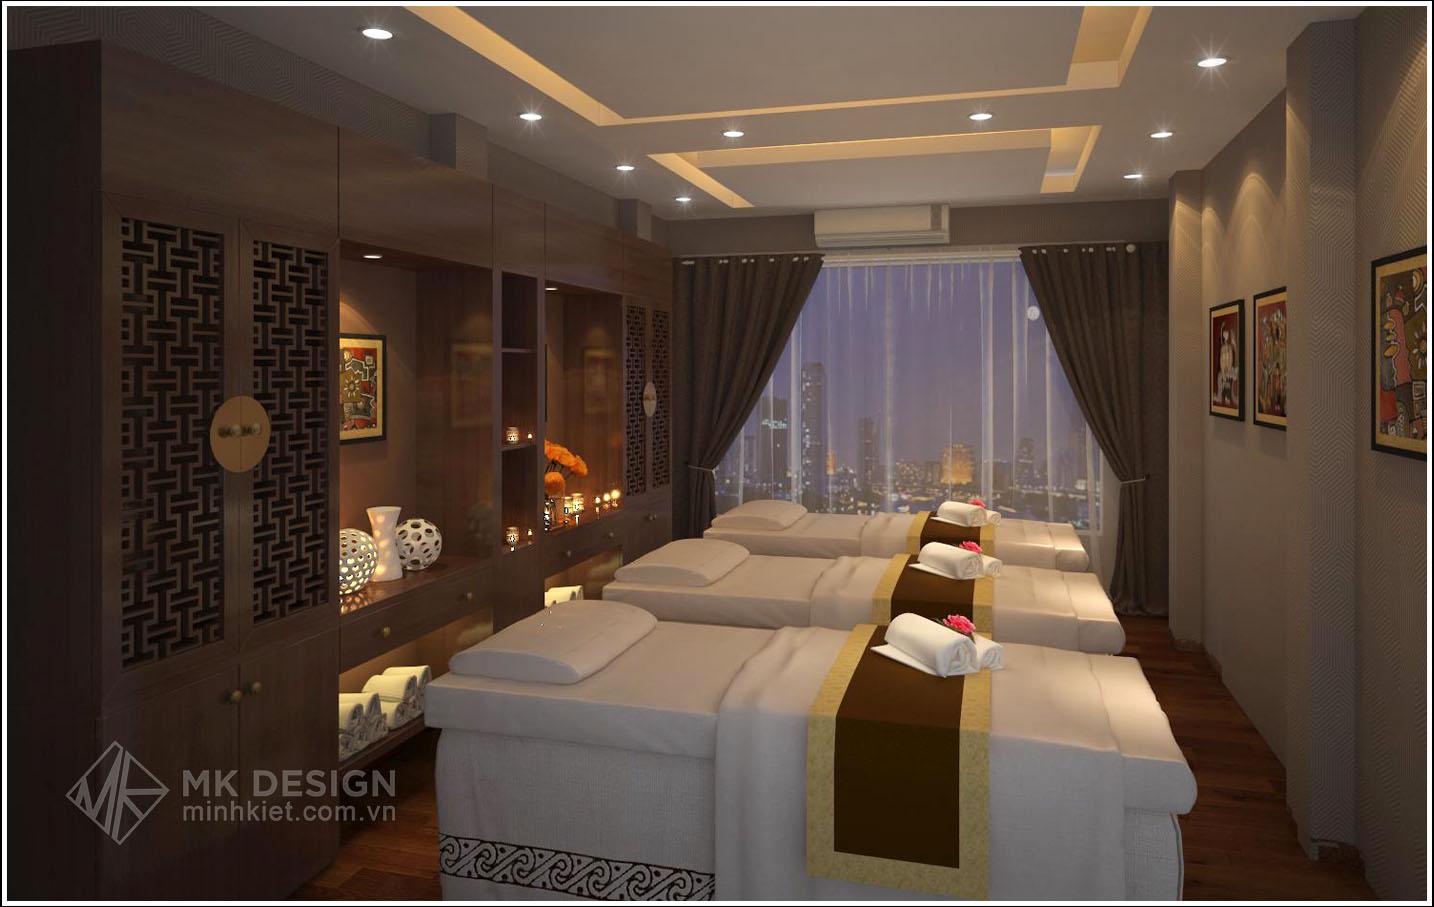 spa-Linh-Pham-Minh-Kiet-design15